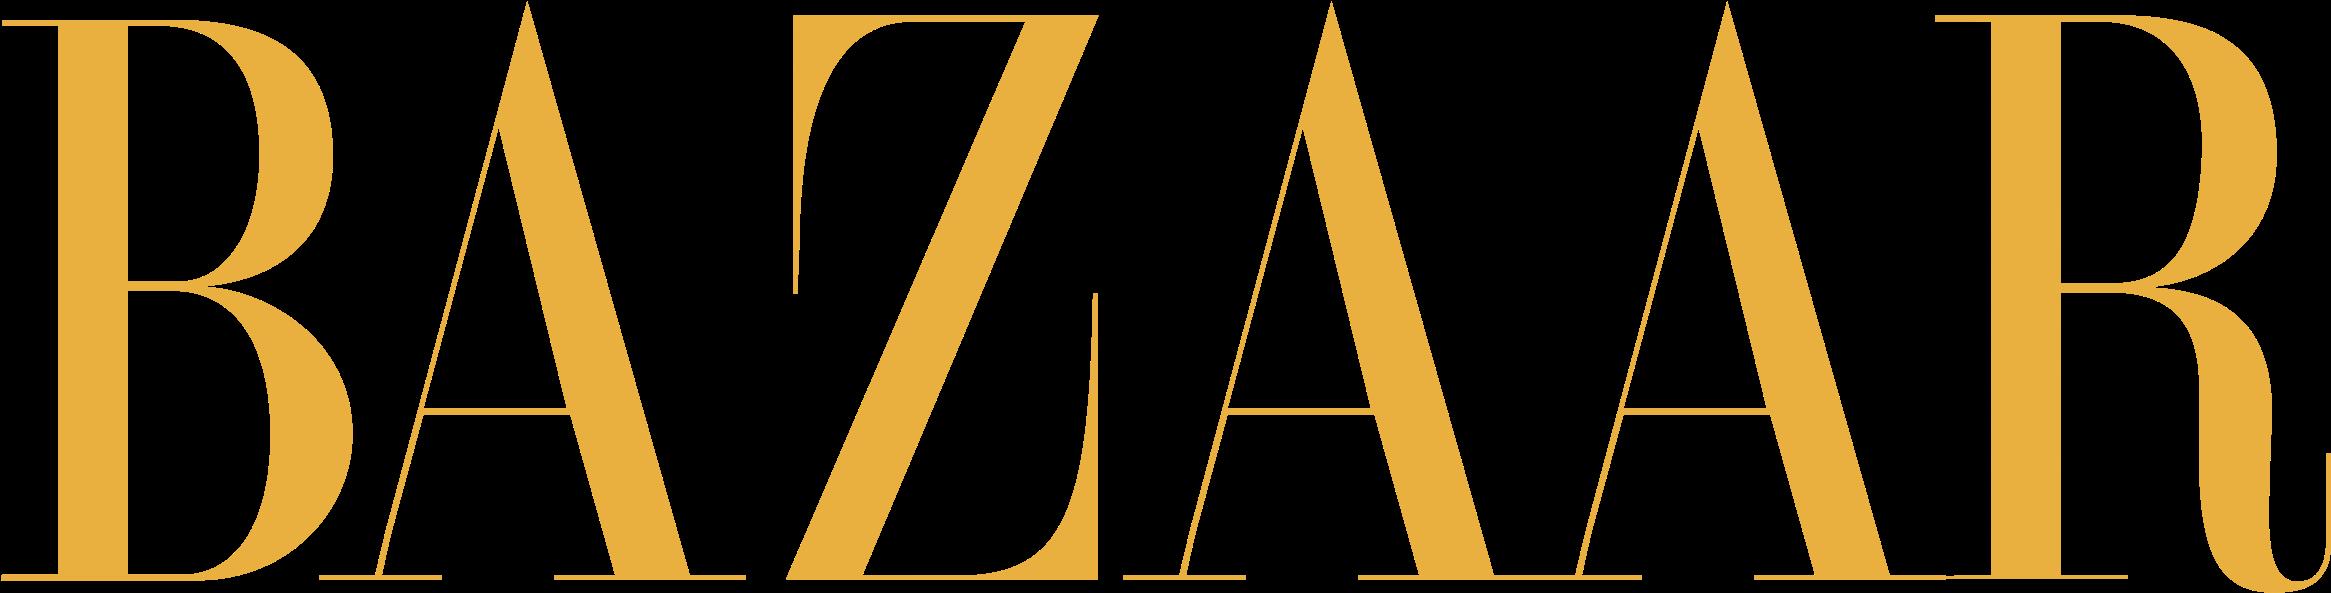 Download Bazaar Harper's Logo Png Transparent PNG Image with No